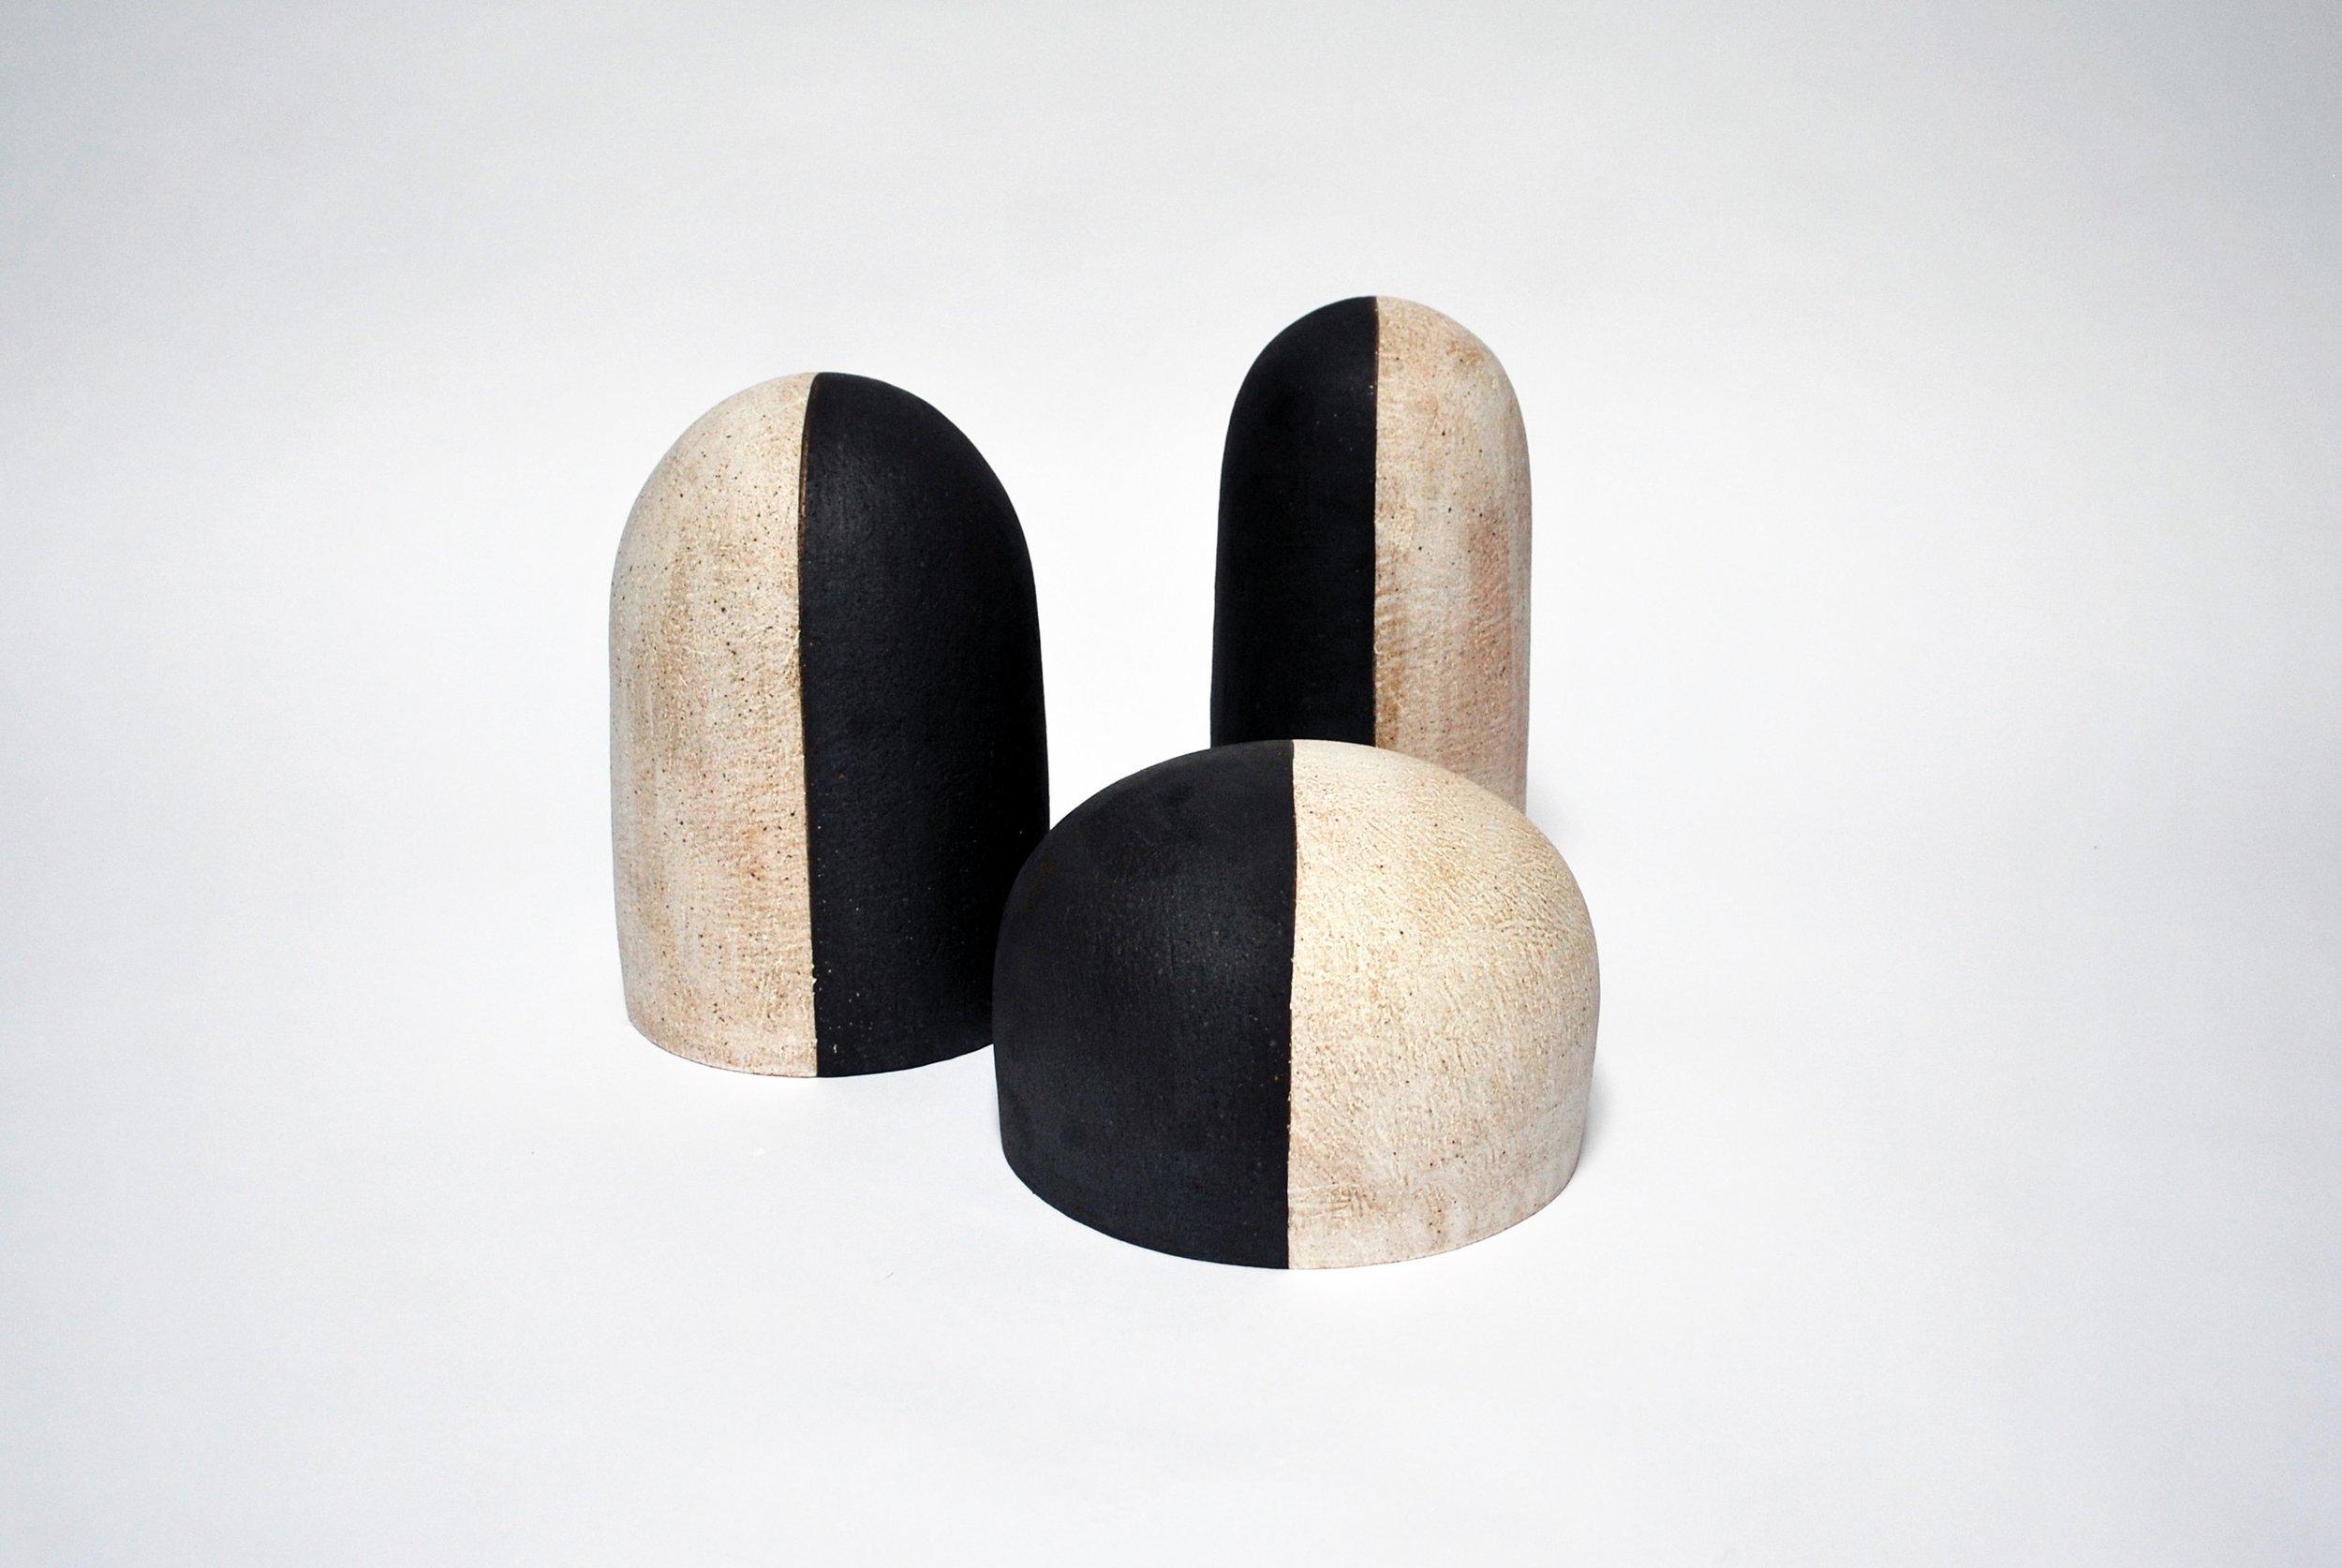 KORA Sculptures